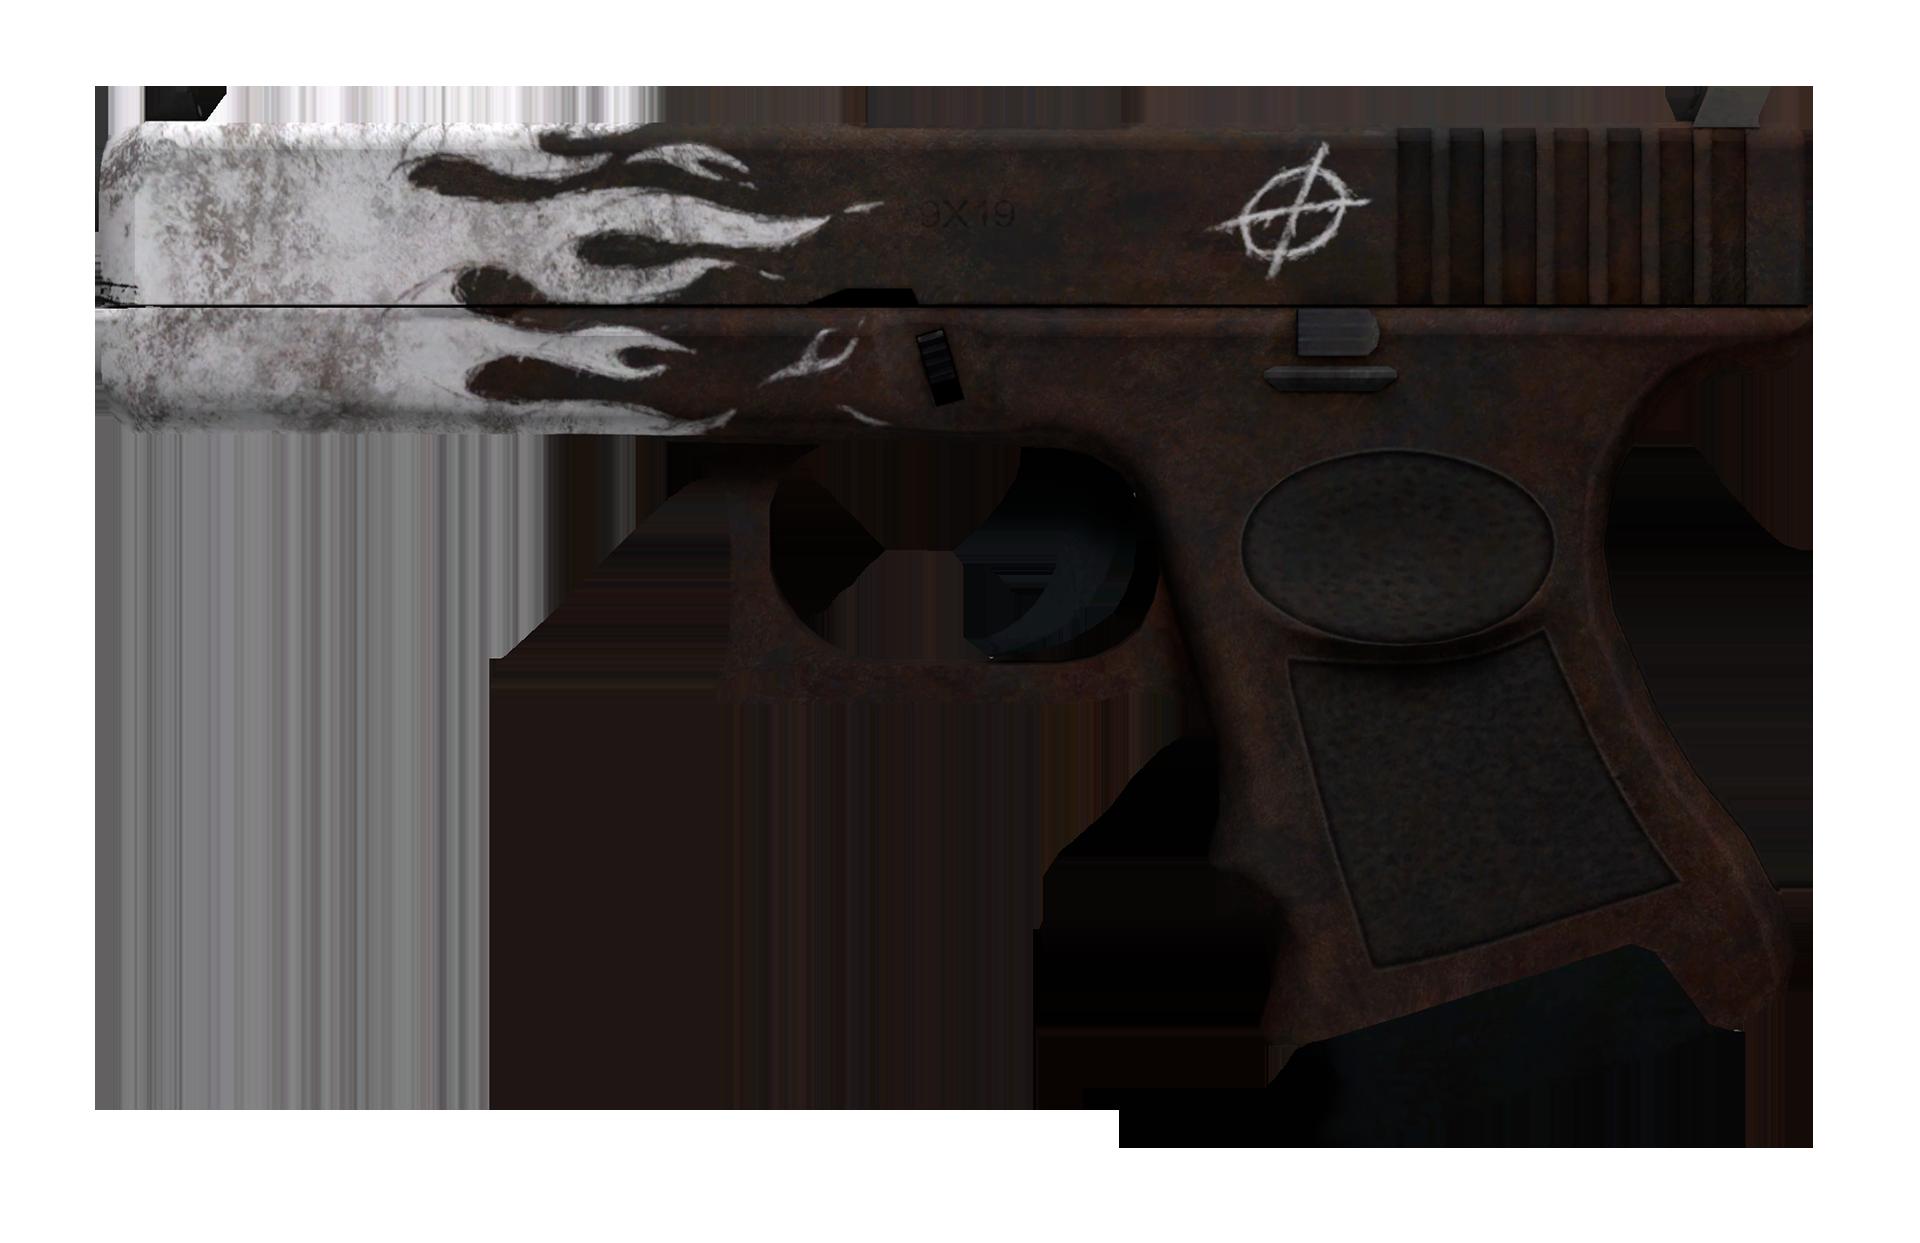 Glock-18 Oxide Blaze Large Rendering